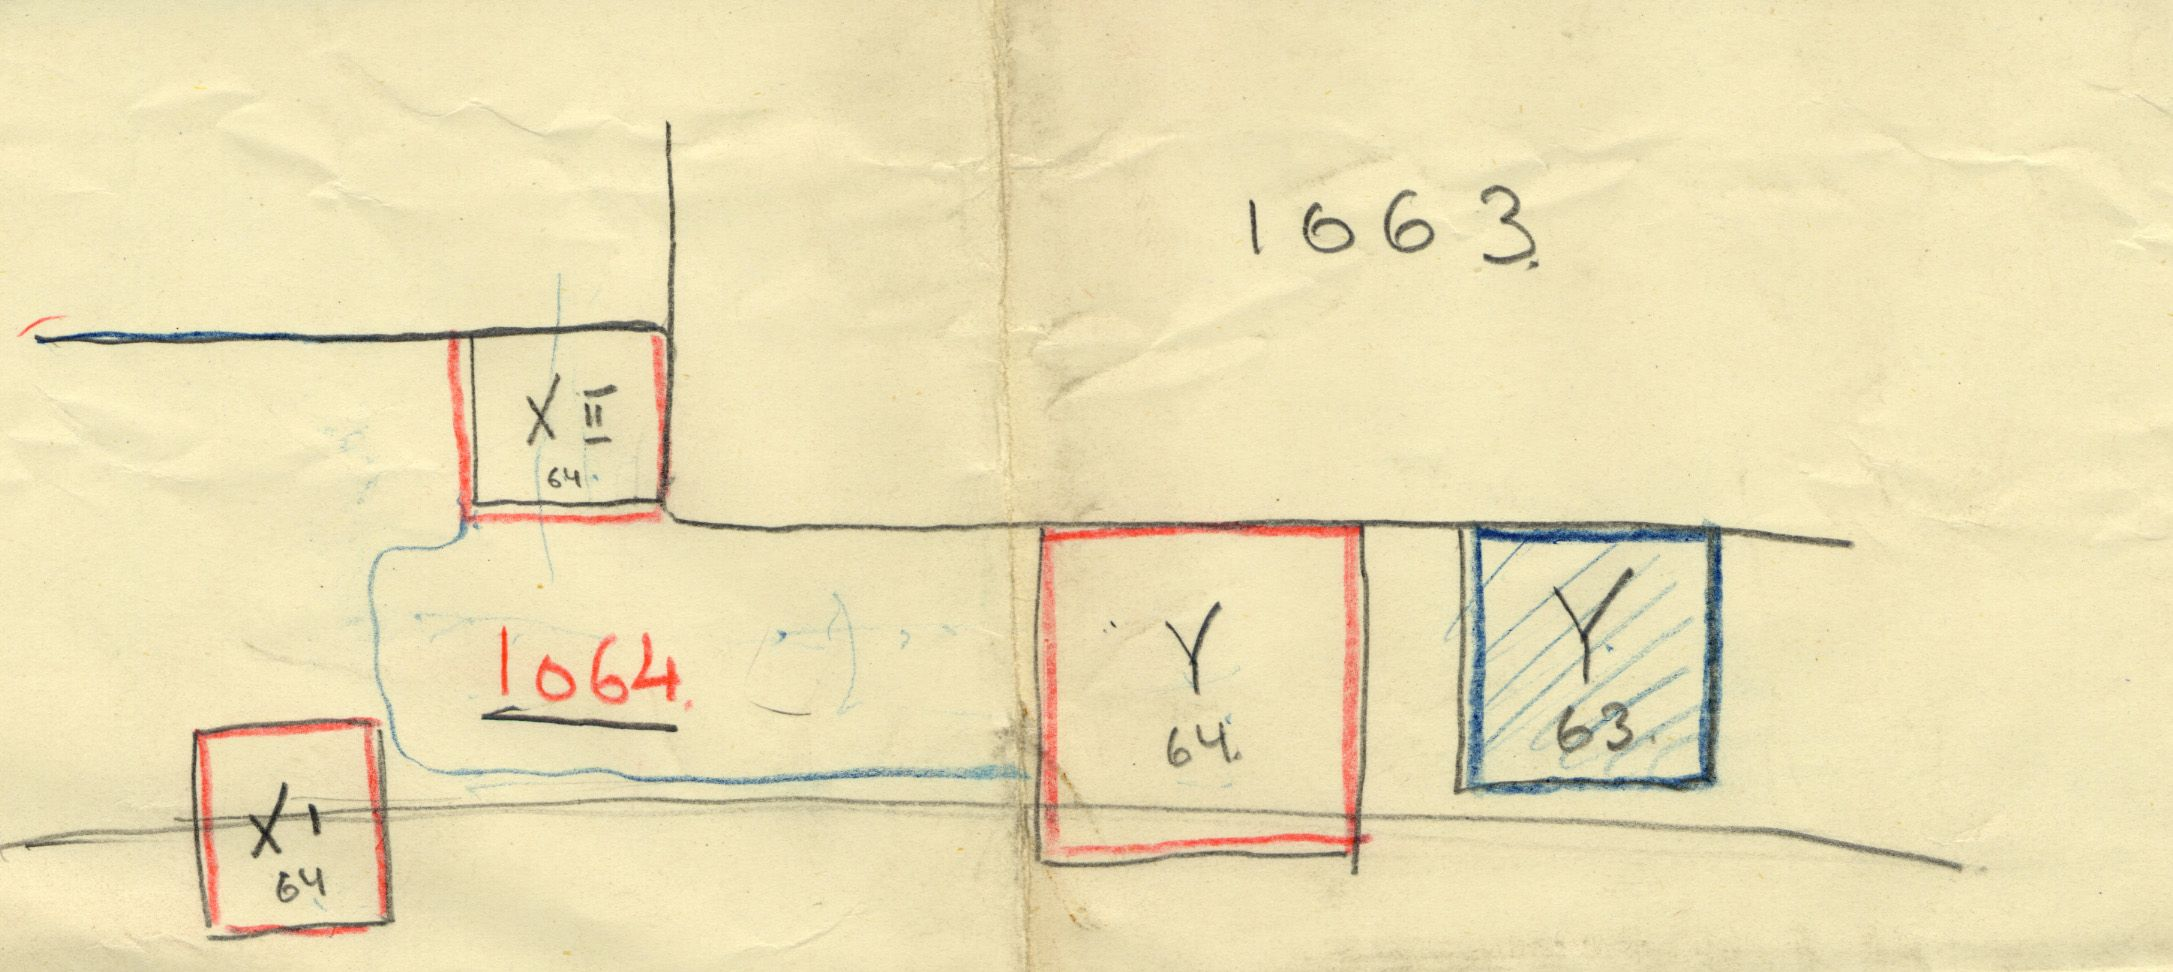 Maps and plans: G 1064, Shaft X1 (= X), X2 (= A), Y & G 1063, Shaft Y